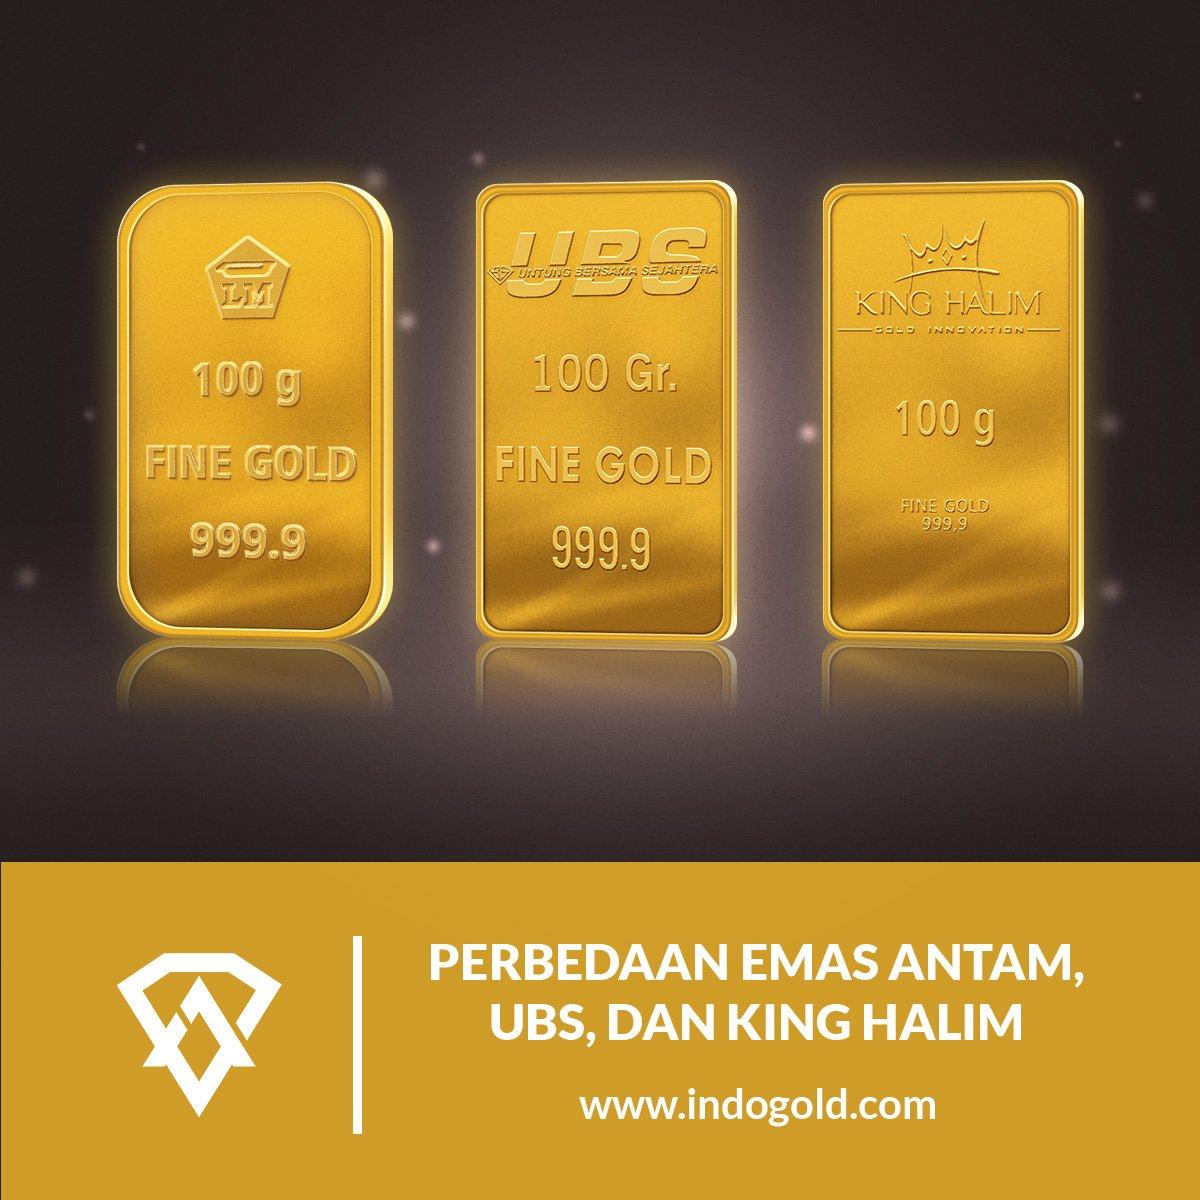 Antam Gold On Twitter 1 Sebetulnya Apa Sih Perbedaan Emas Antam